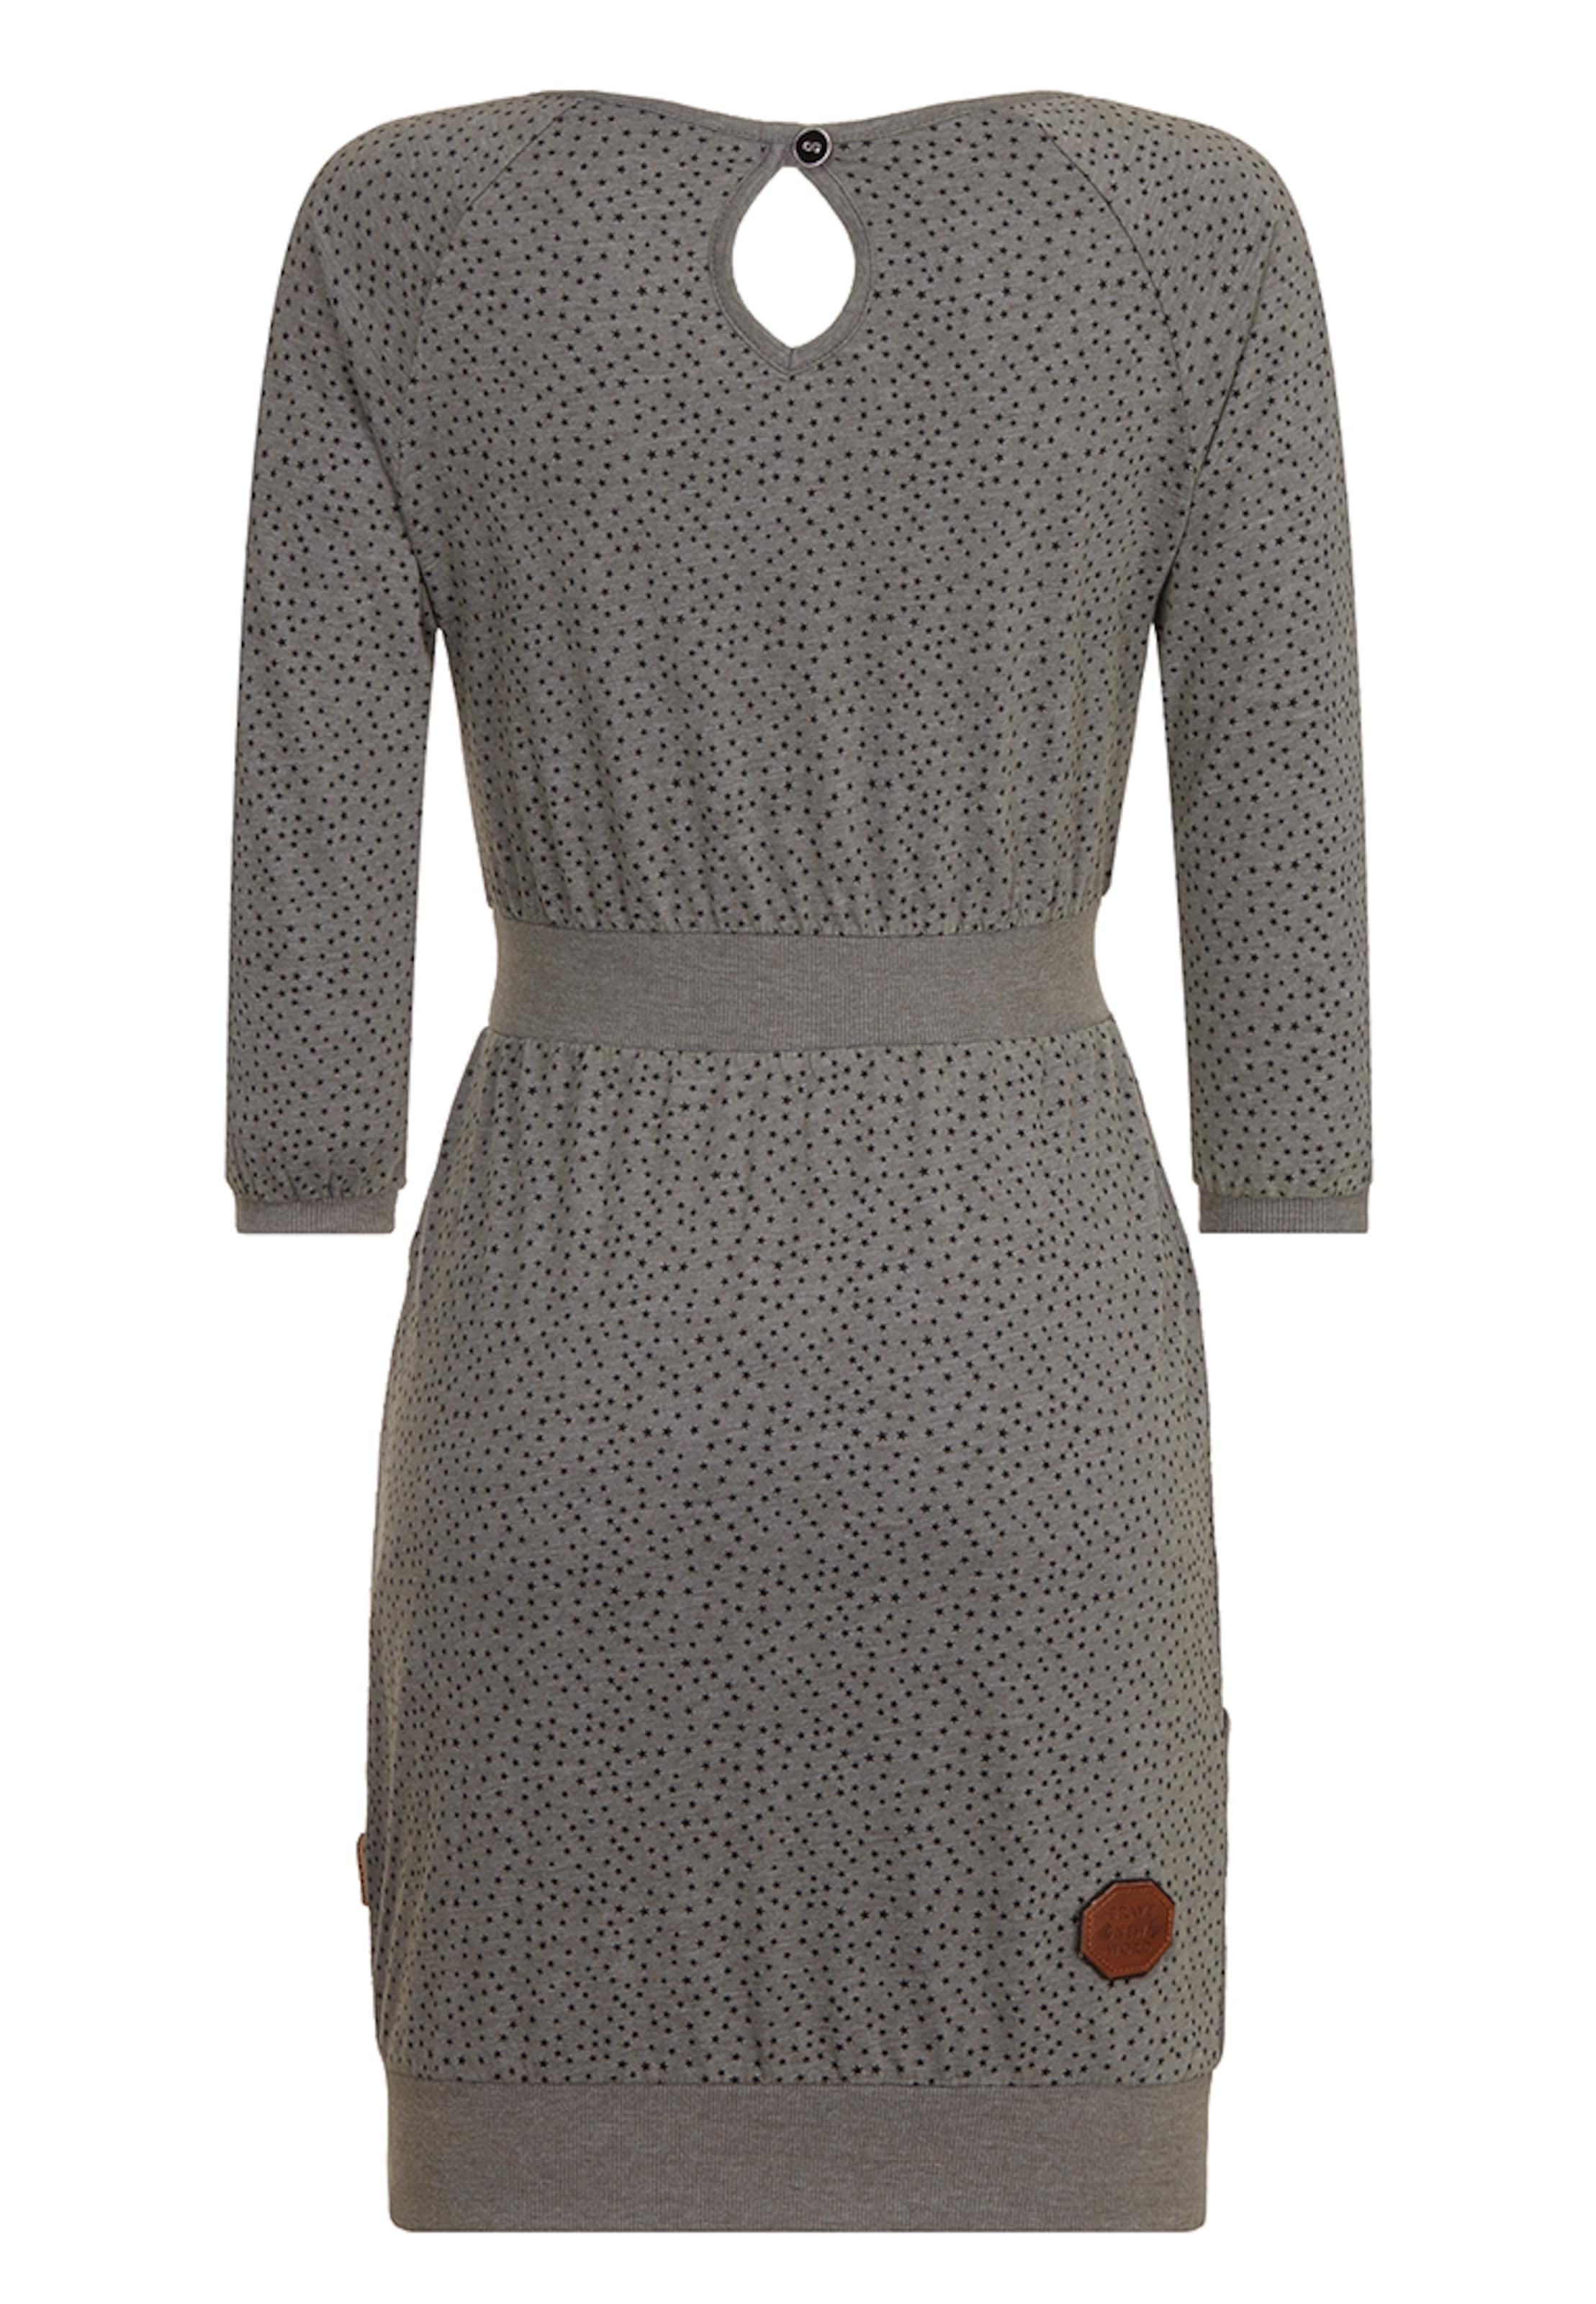 In Naketano The End' Graumeliert 'dress Kleid QdsthxrC